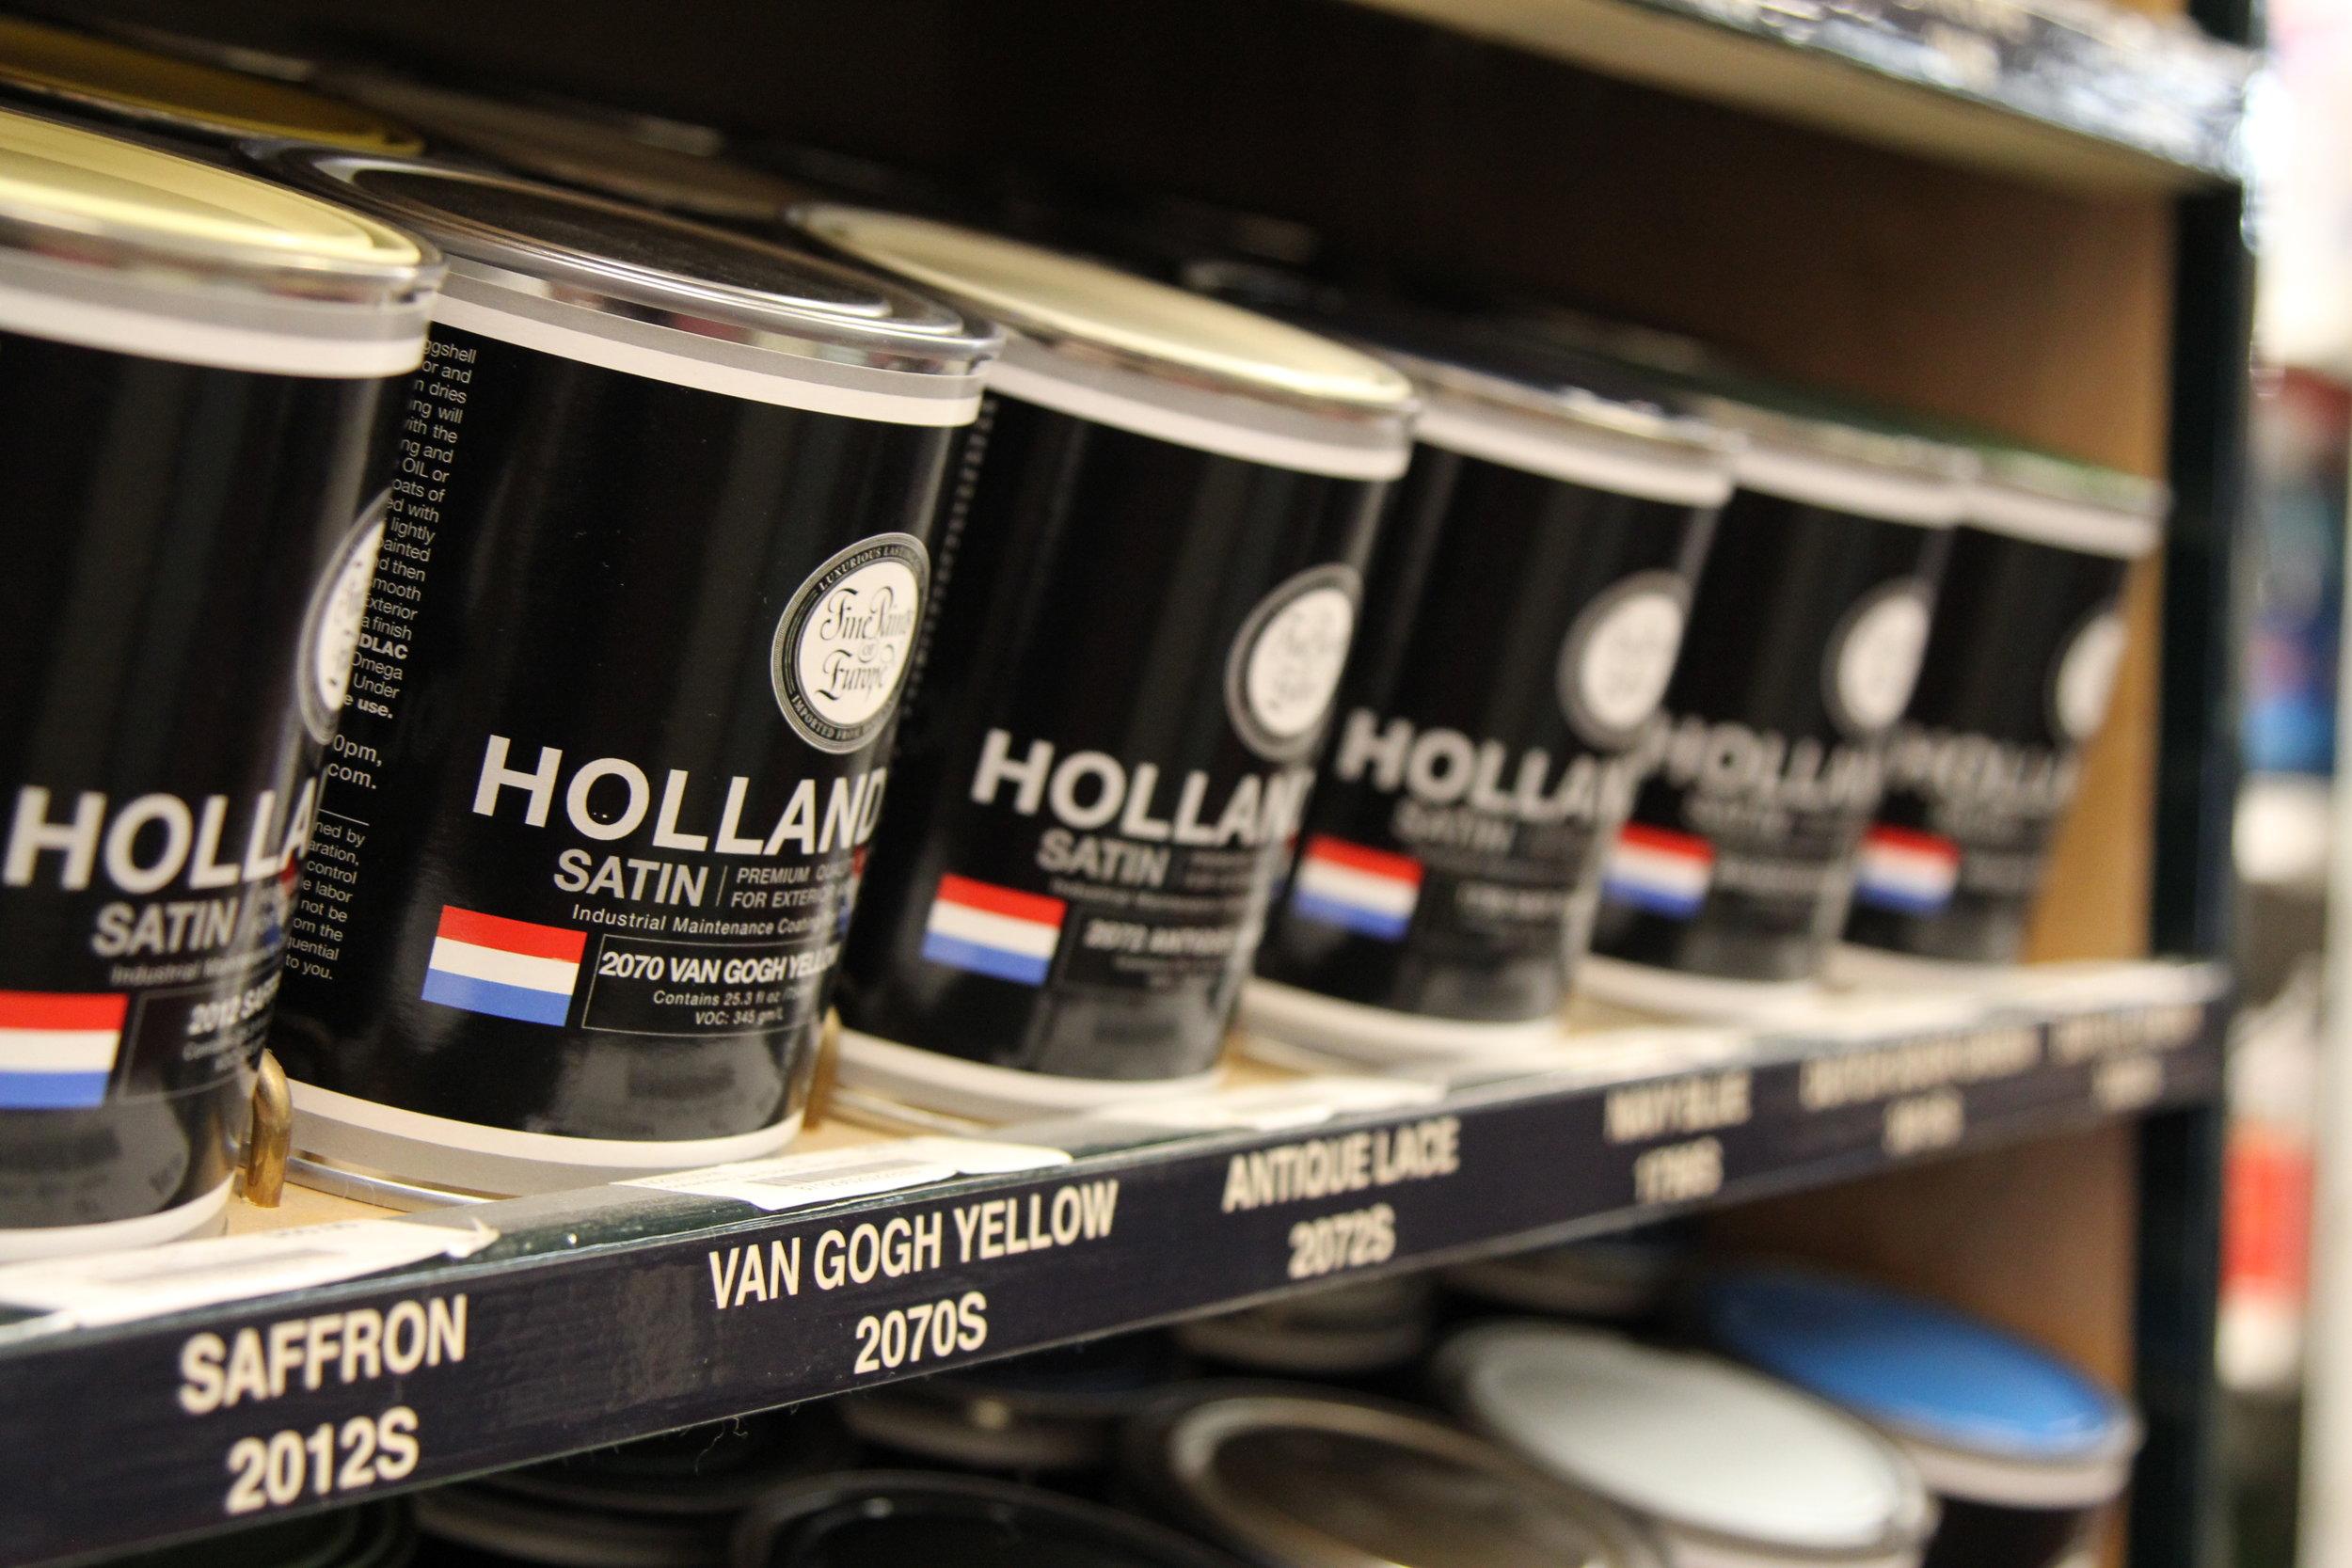 Fine paints of Europe Hollandlac